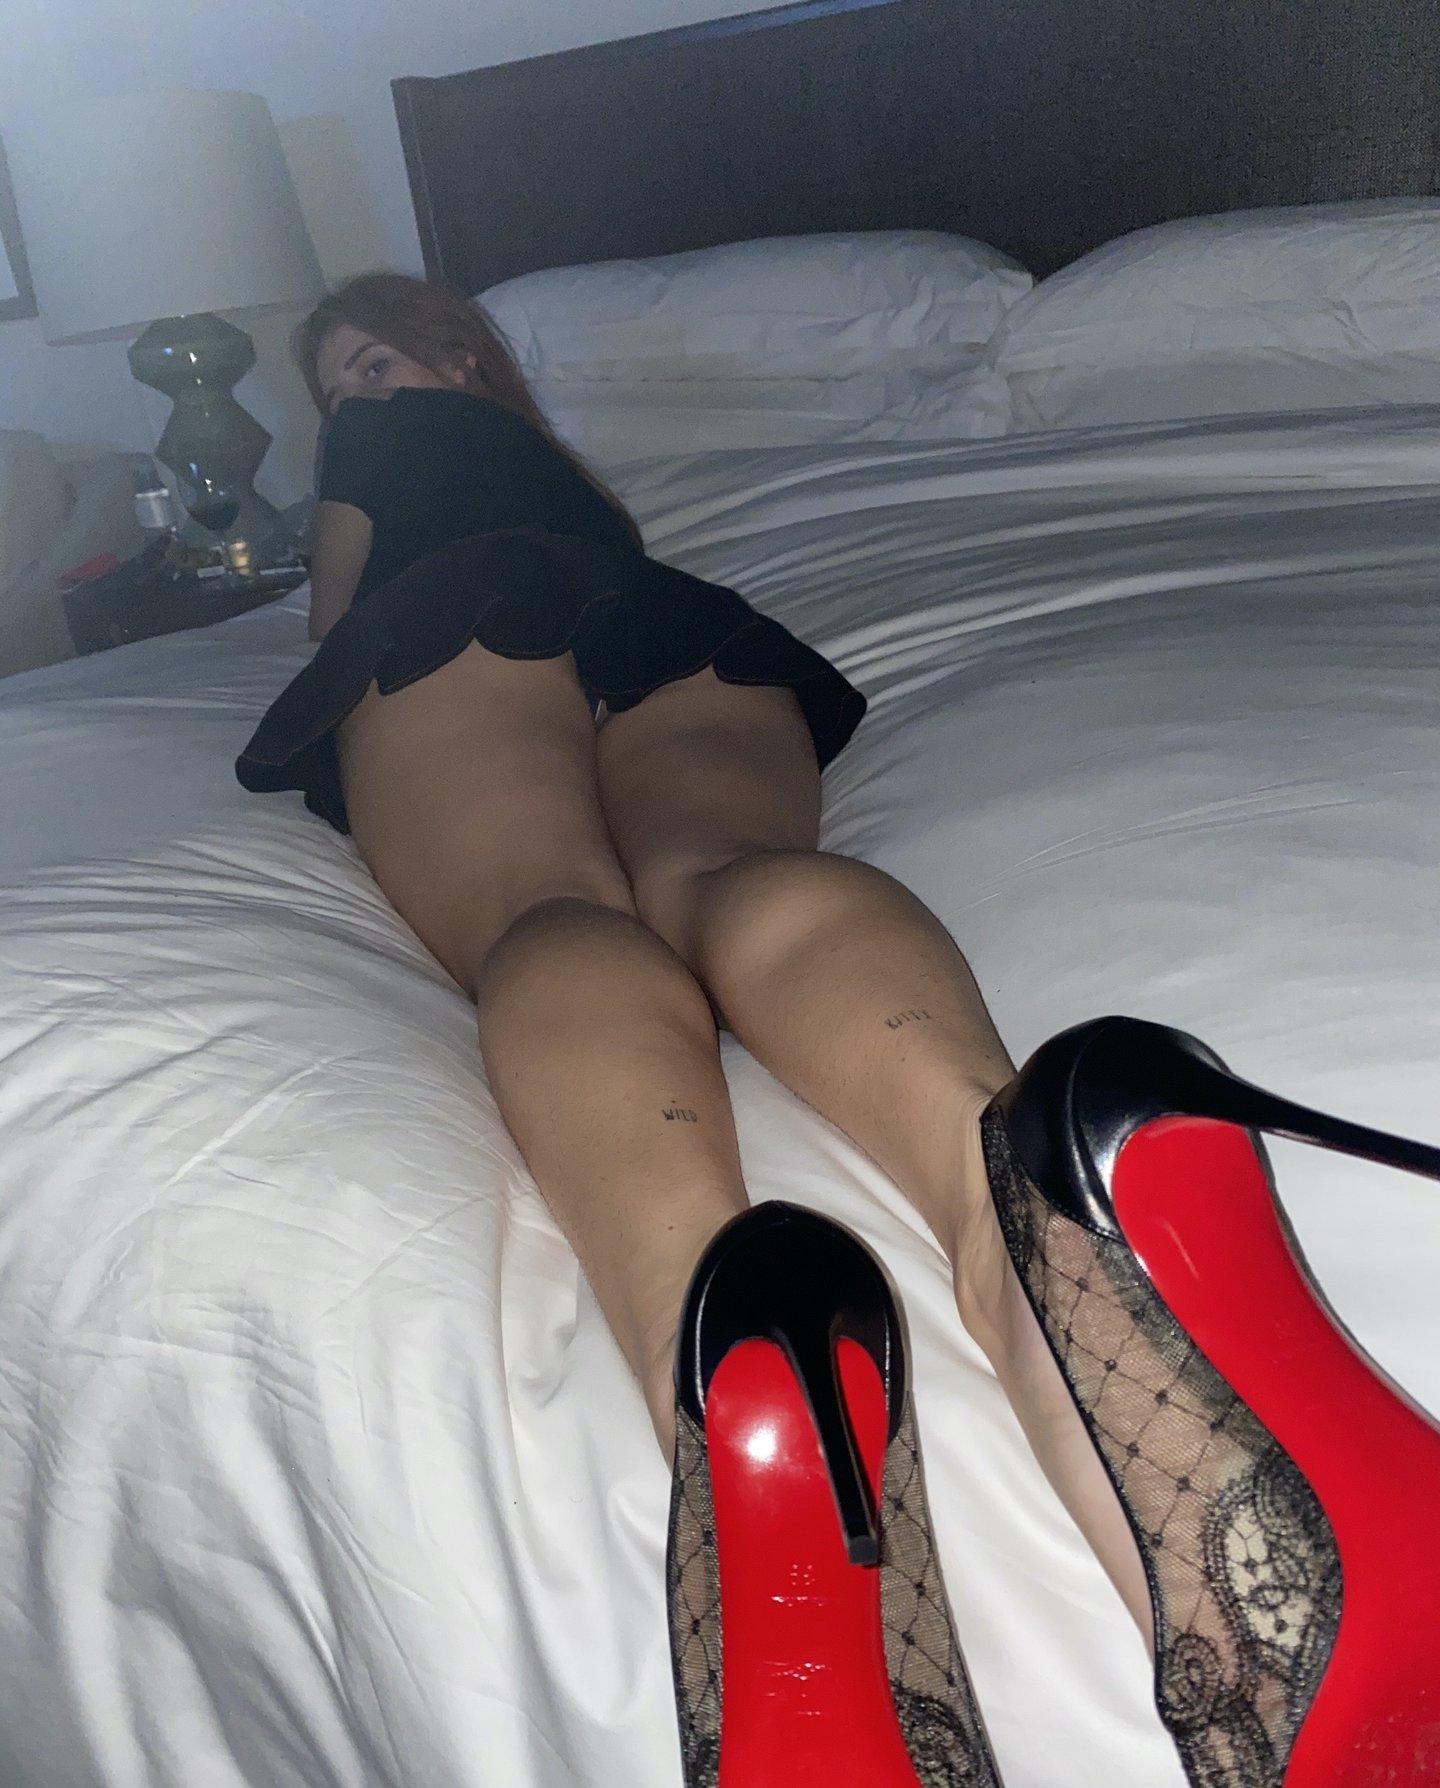 Bella Thorne Bellathorne Onlyfans Nude Leaks 0036